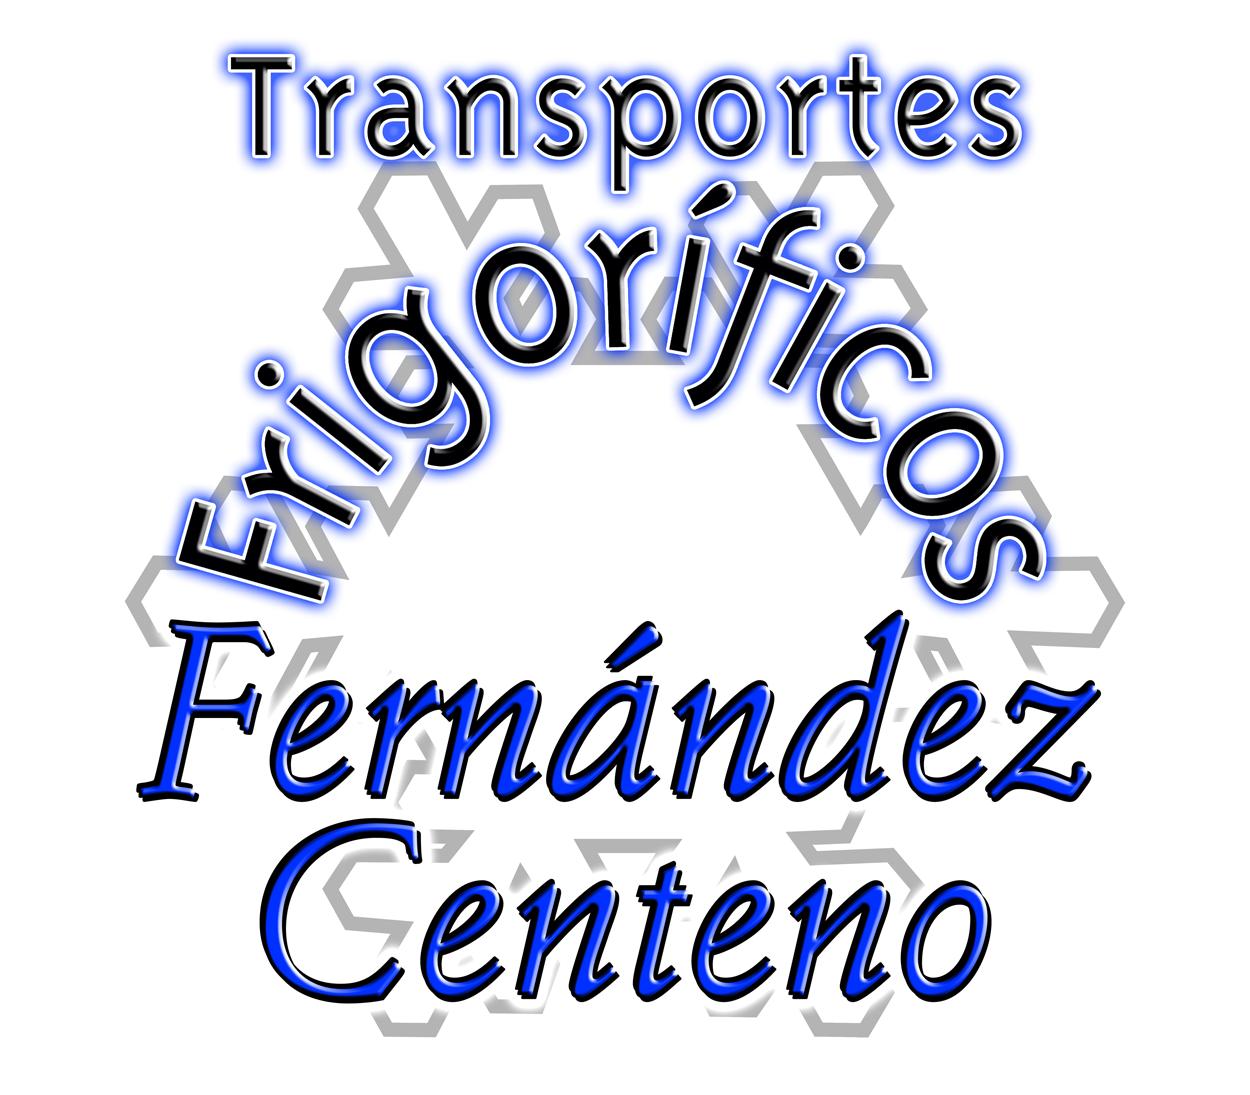 FERNÁNDEZ CENTENO